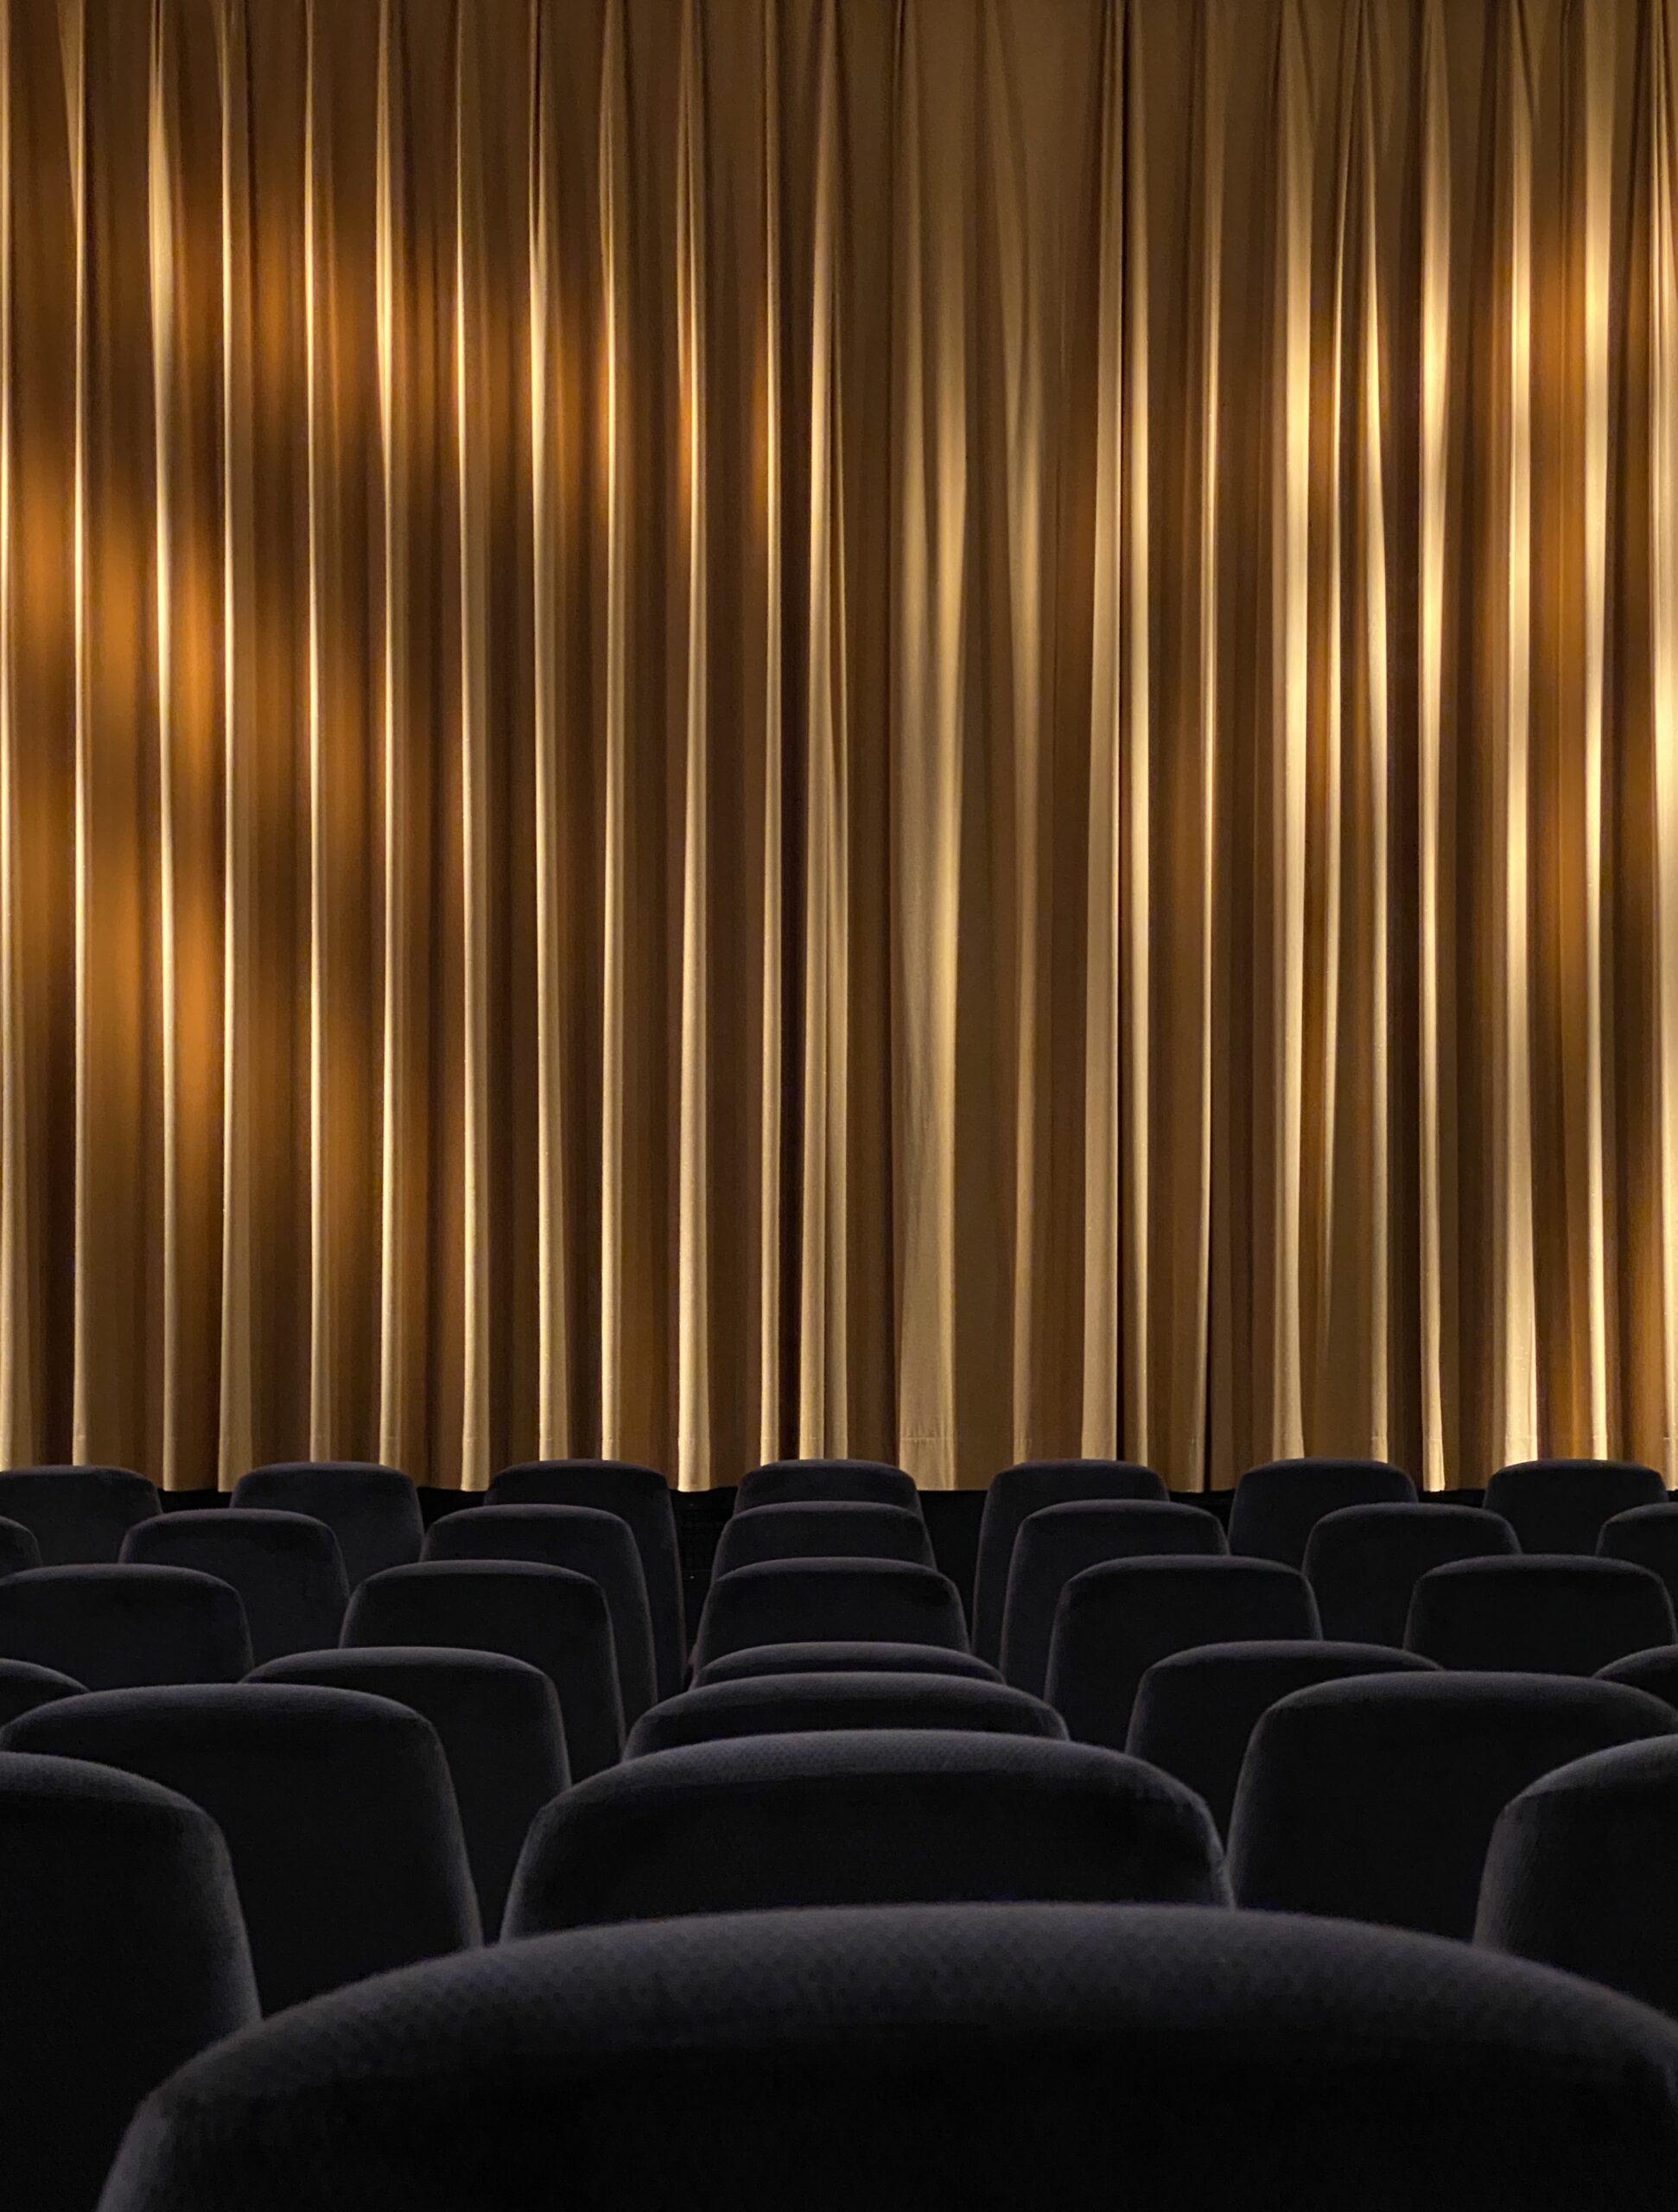 private Kinovorstellung münchen